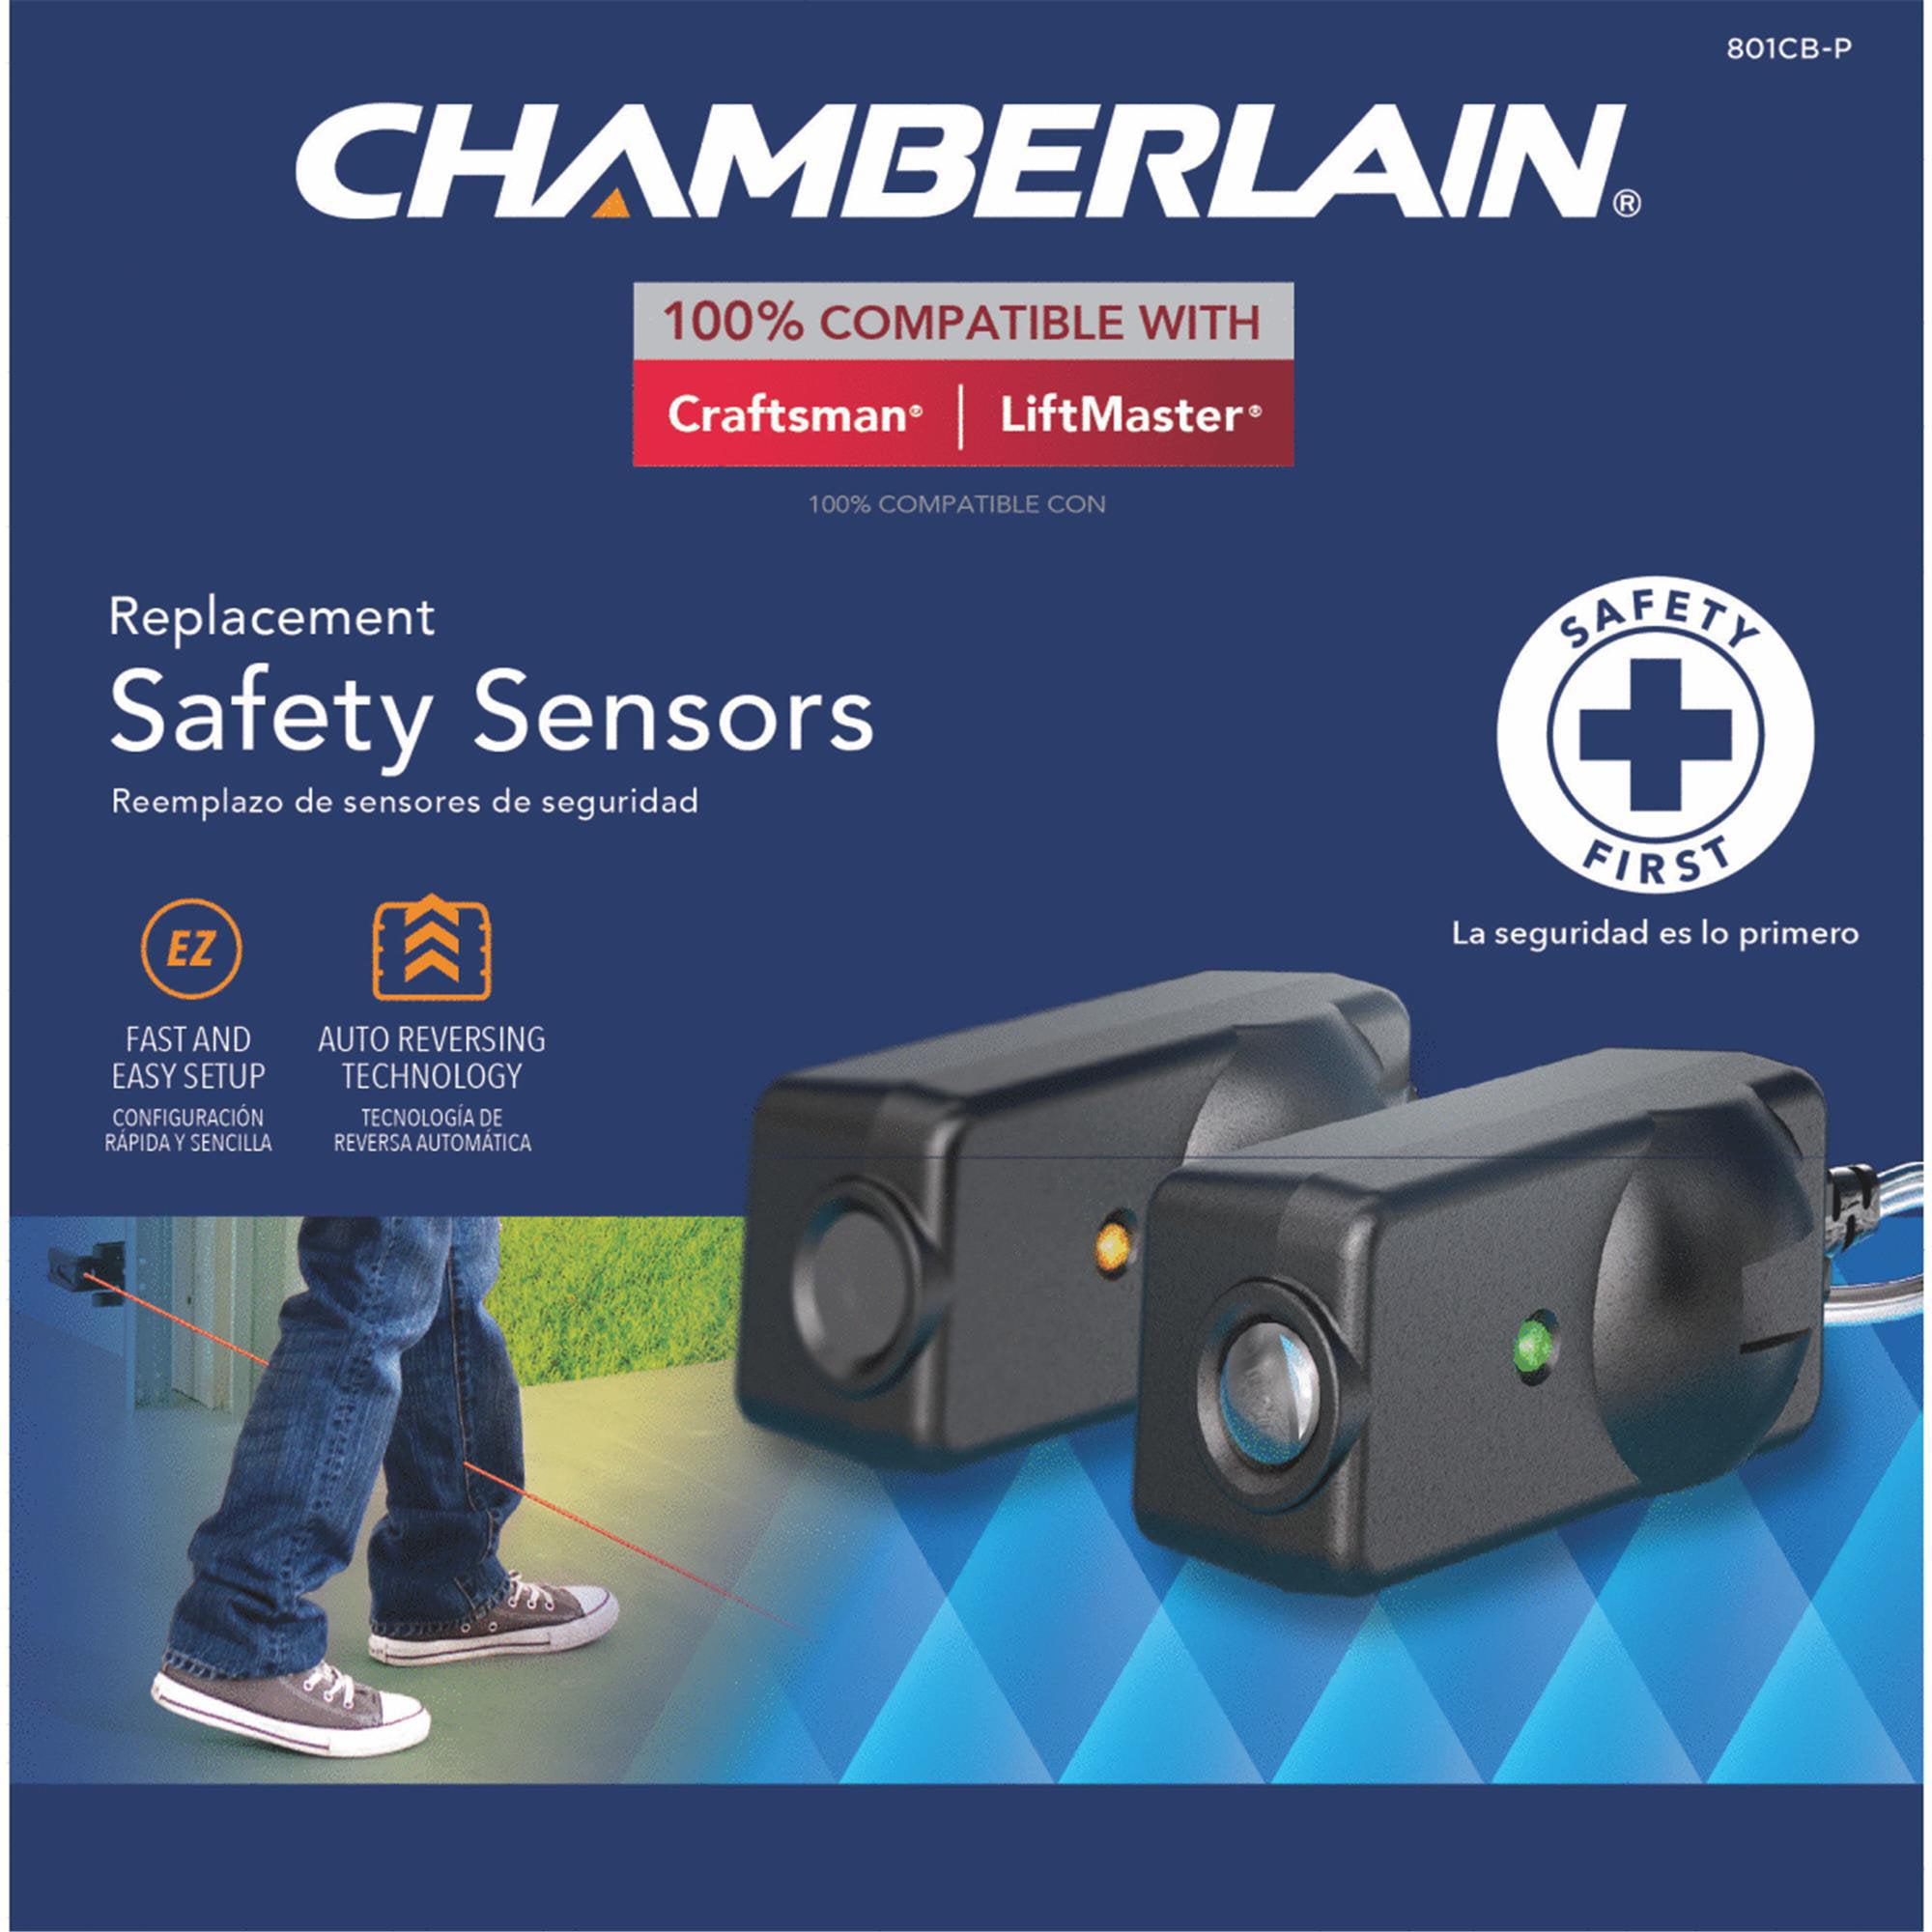 Chamberlain 801CB-P Black Garage Replacement Safety Sensors by Chamberlain